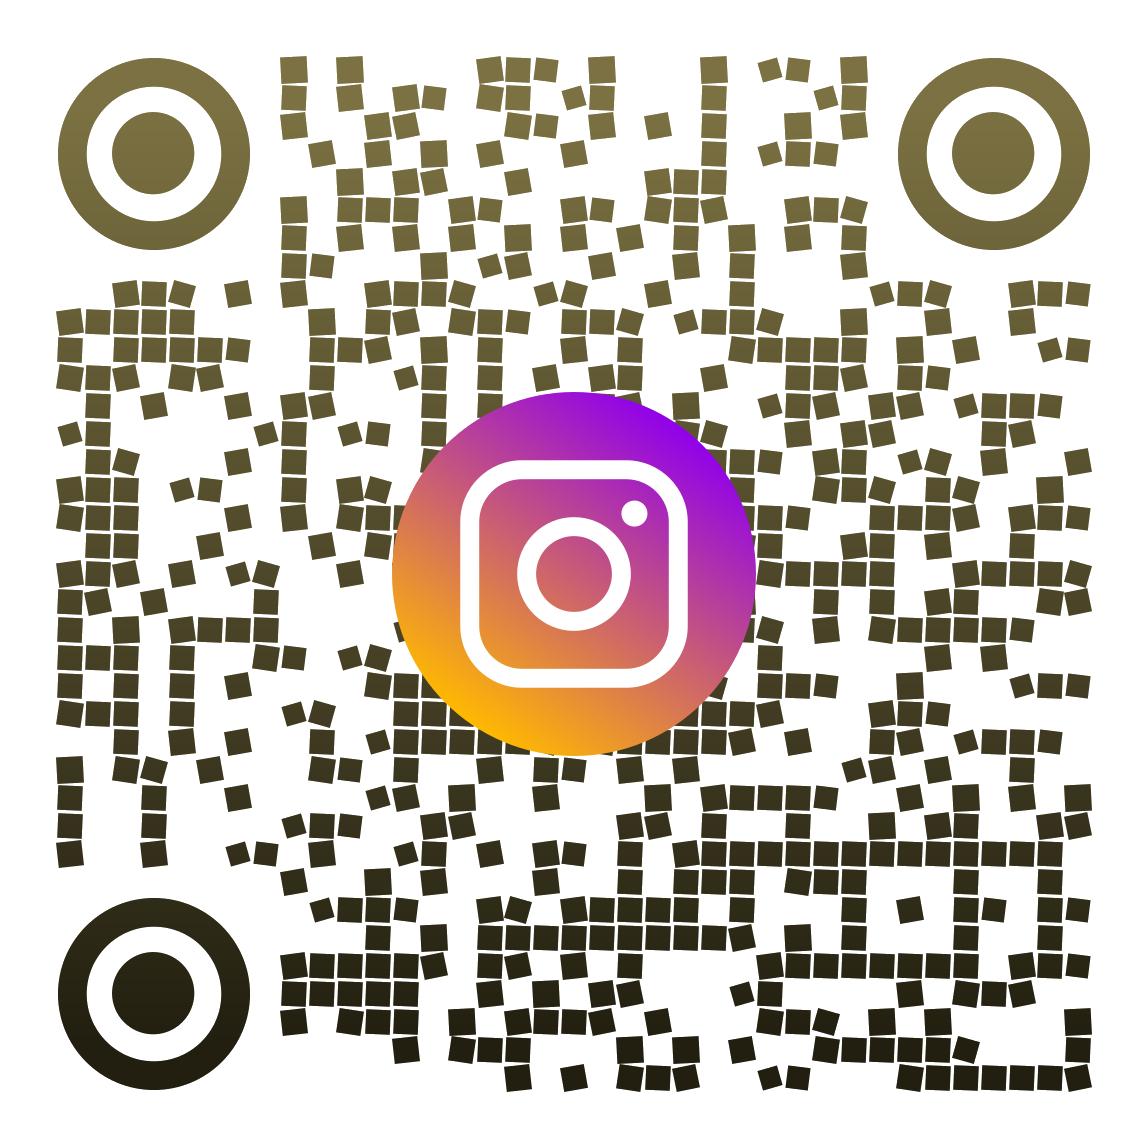 My Instagram qr code Address, Amin Monfared.